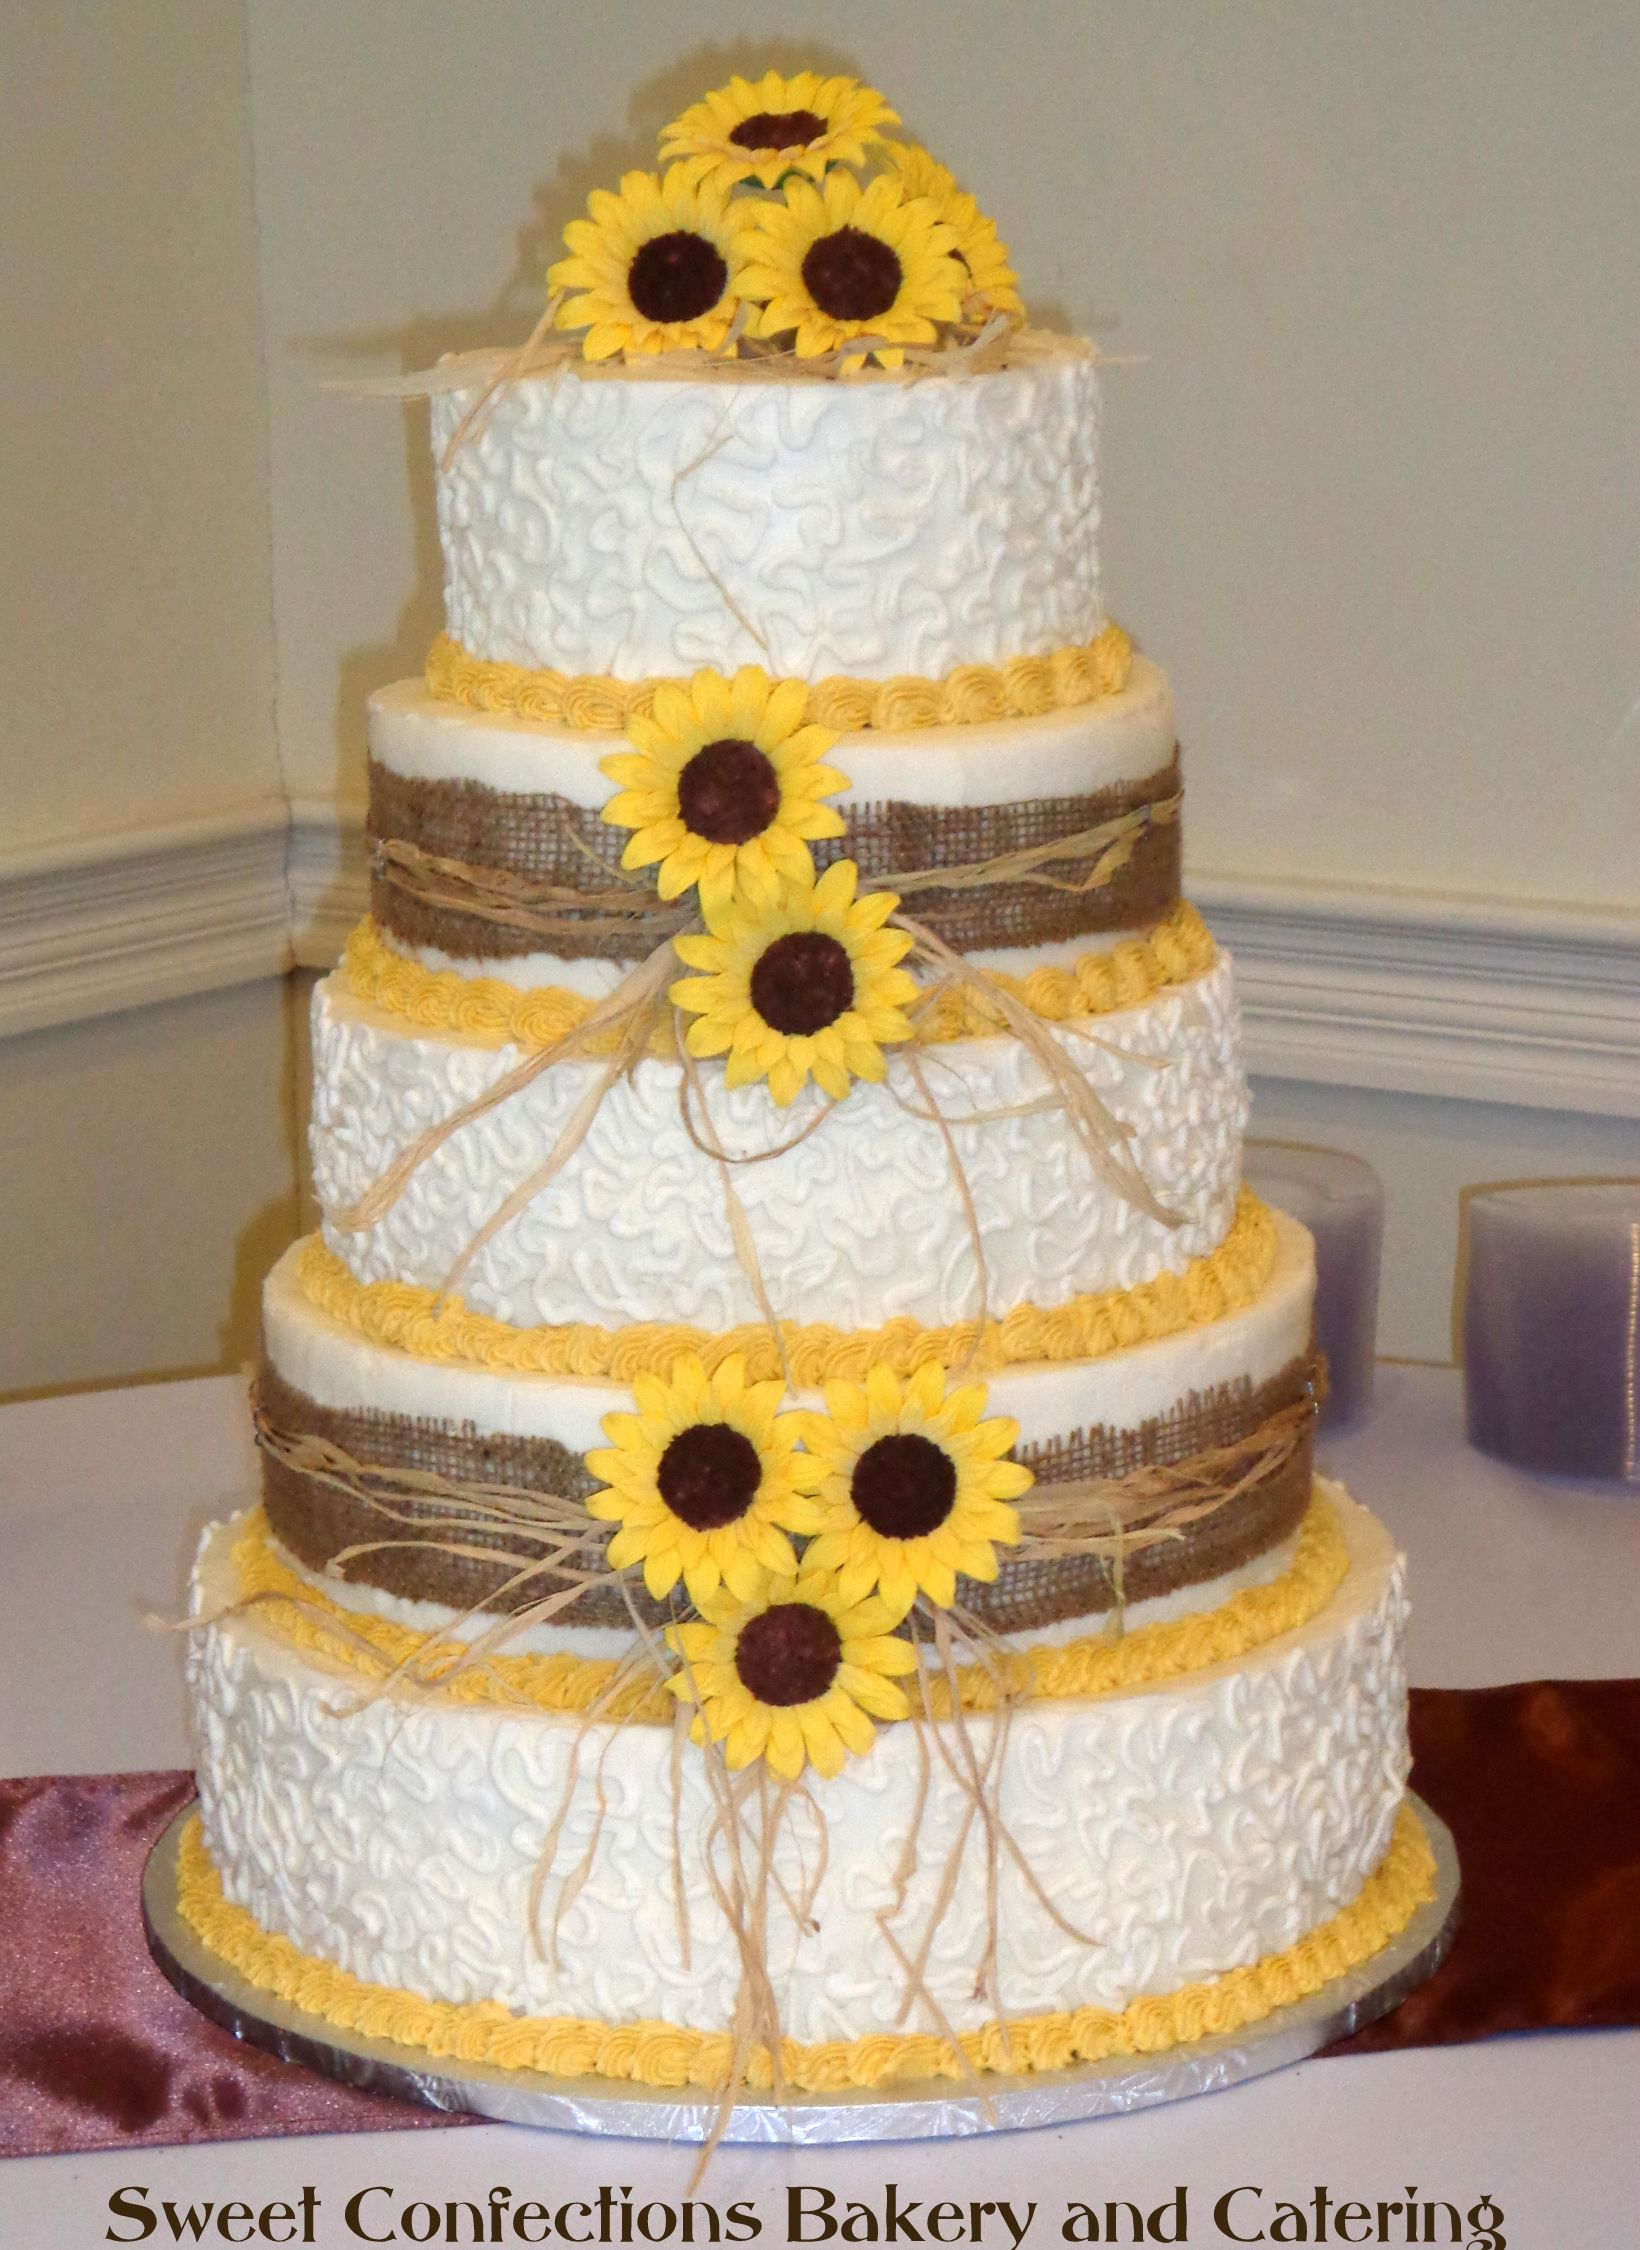 Sunflower Dream. This cake has fondant sunflowers. It has